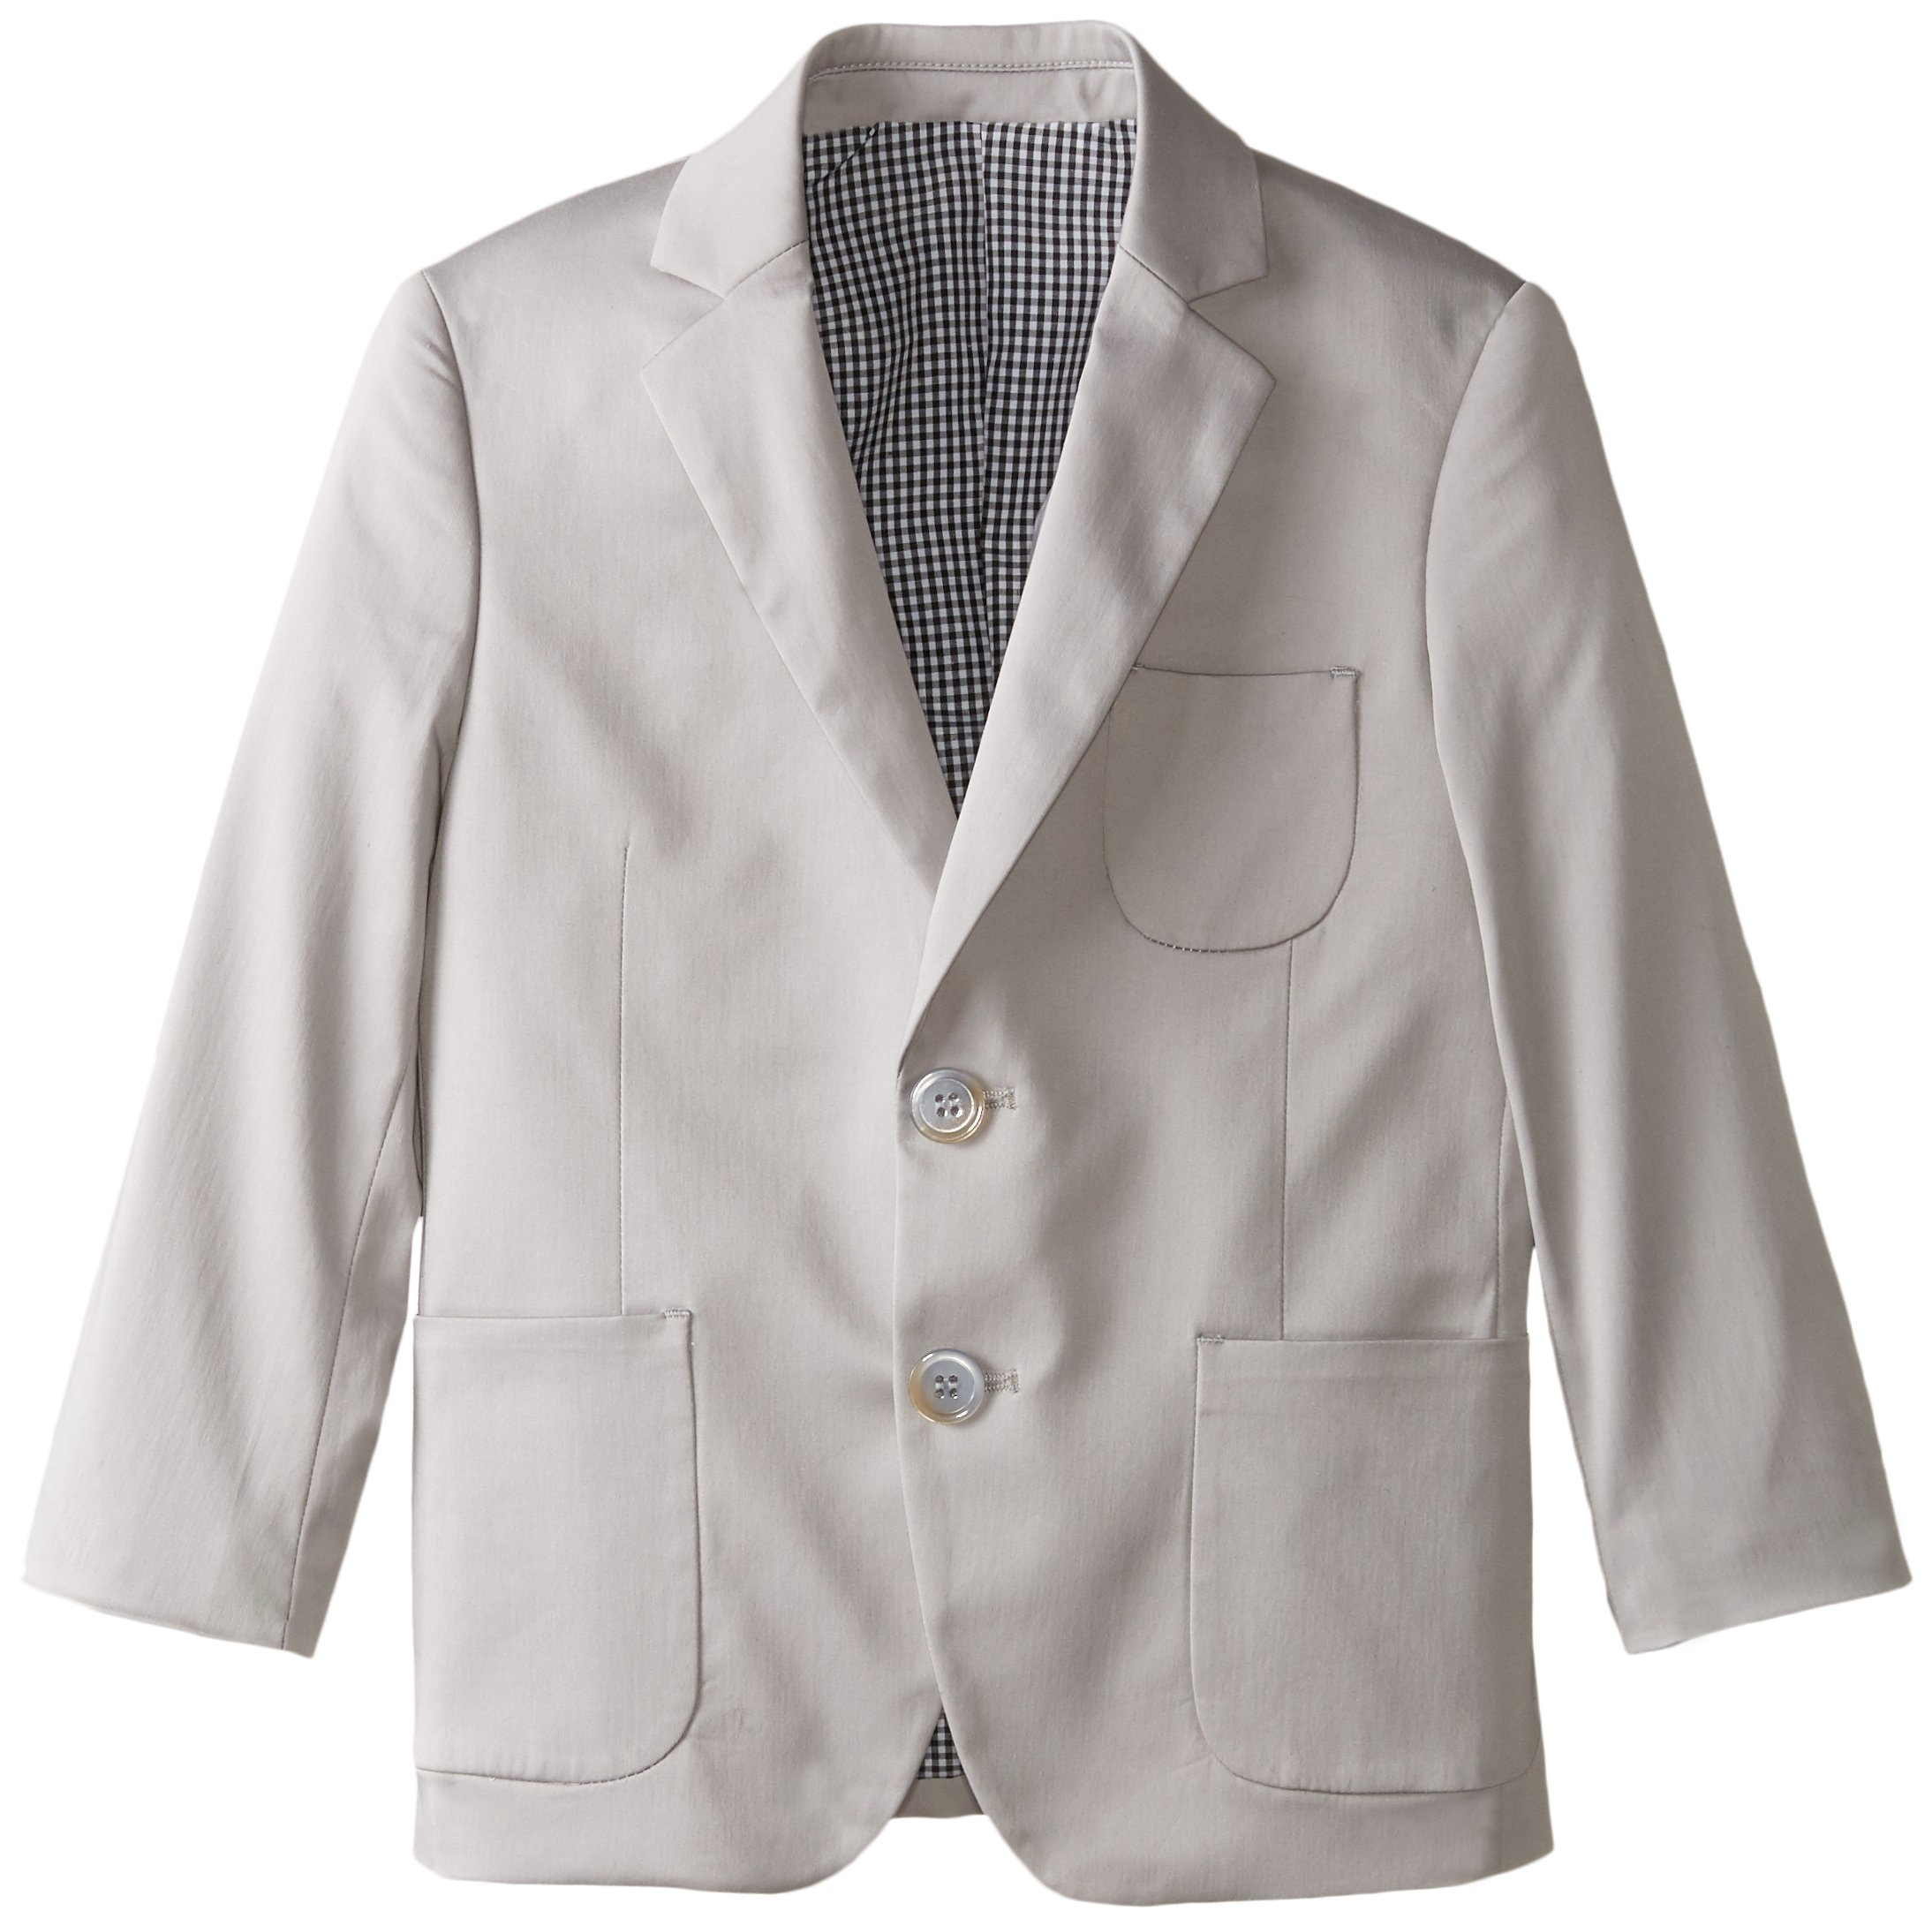 Isaac Mizrahi Little Boys' Little Boy's Cotton Solid Blazer, Grey, 6